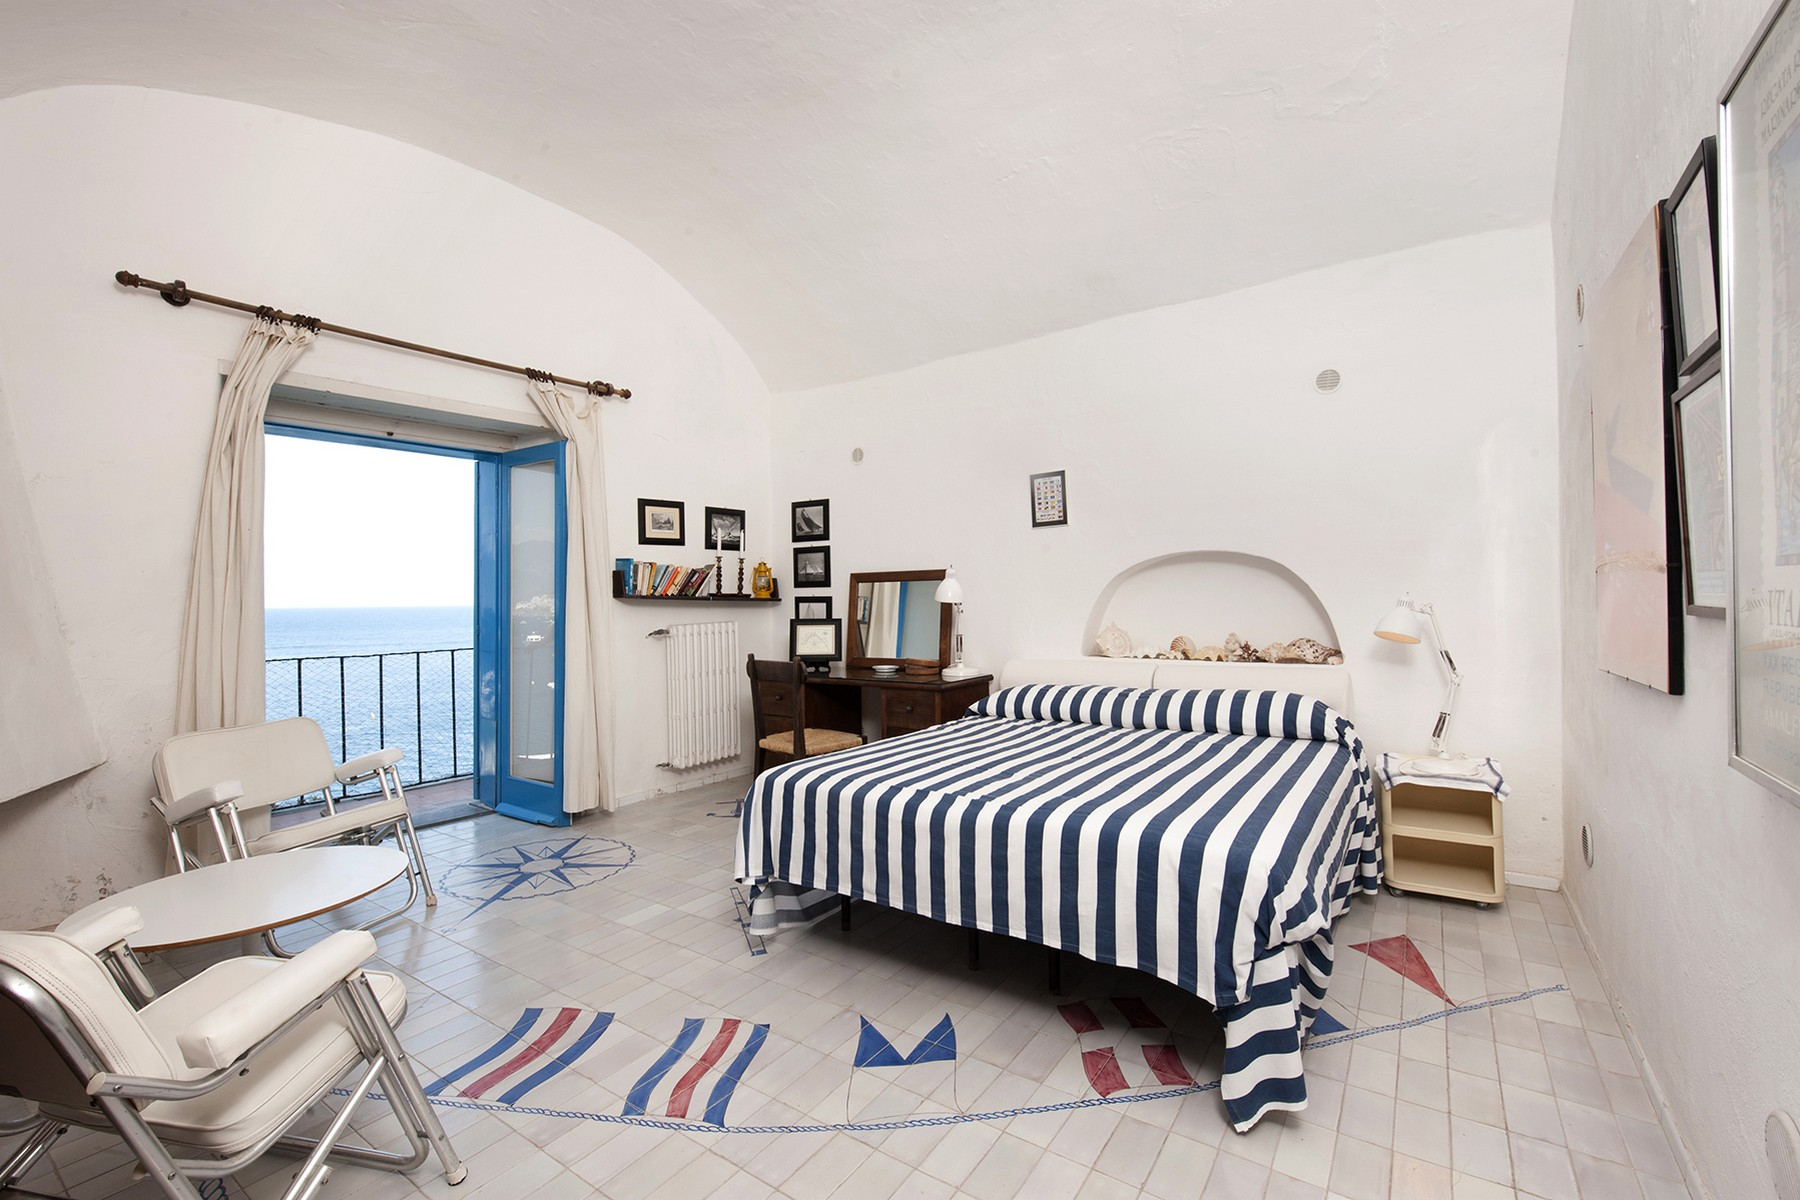 Additional photo for property listing at Villa Chandon Via Marina Conca Dei Marini, Salerno 84010 Italia